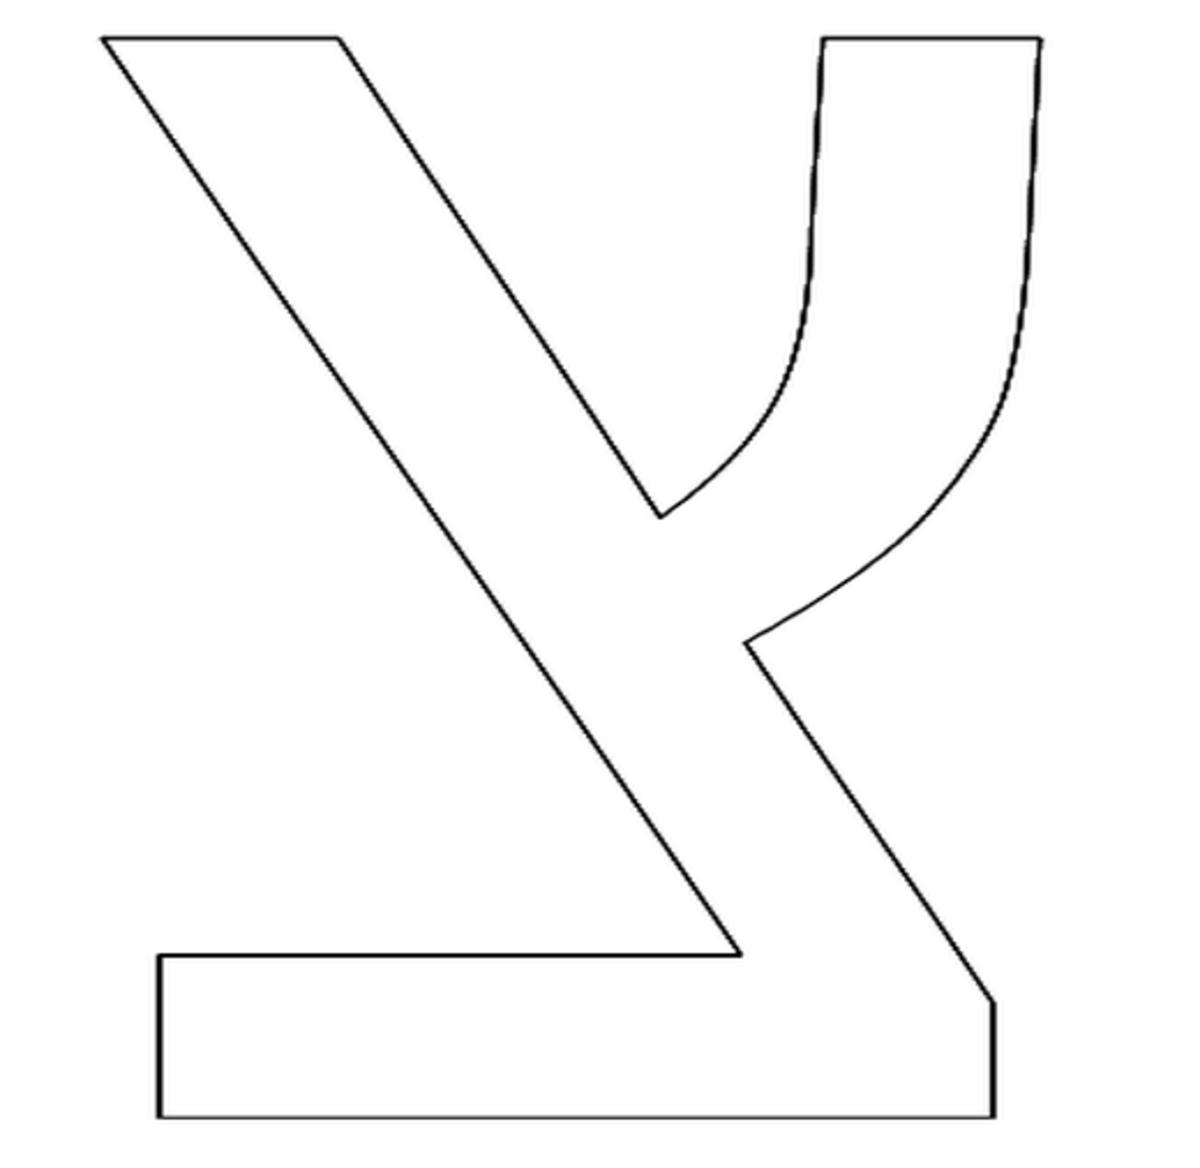 Hebrew Letter Tzade Coloring Page - דף צביעה אוֹת צדי